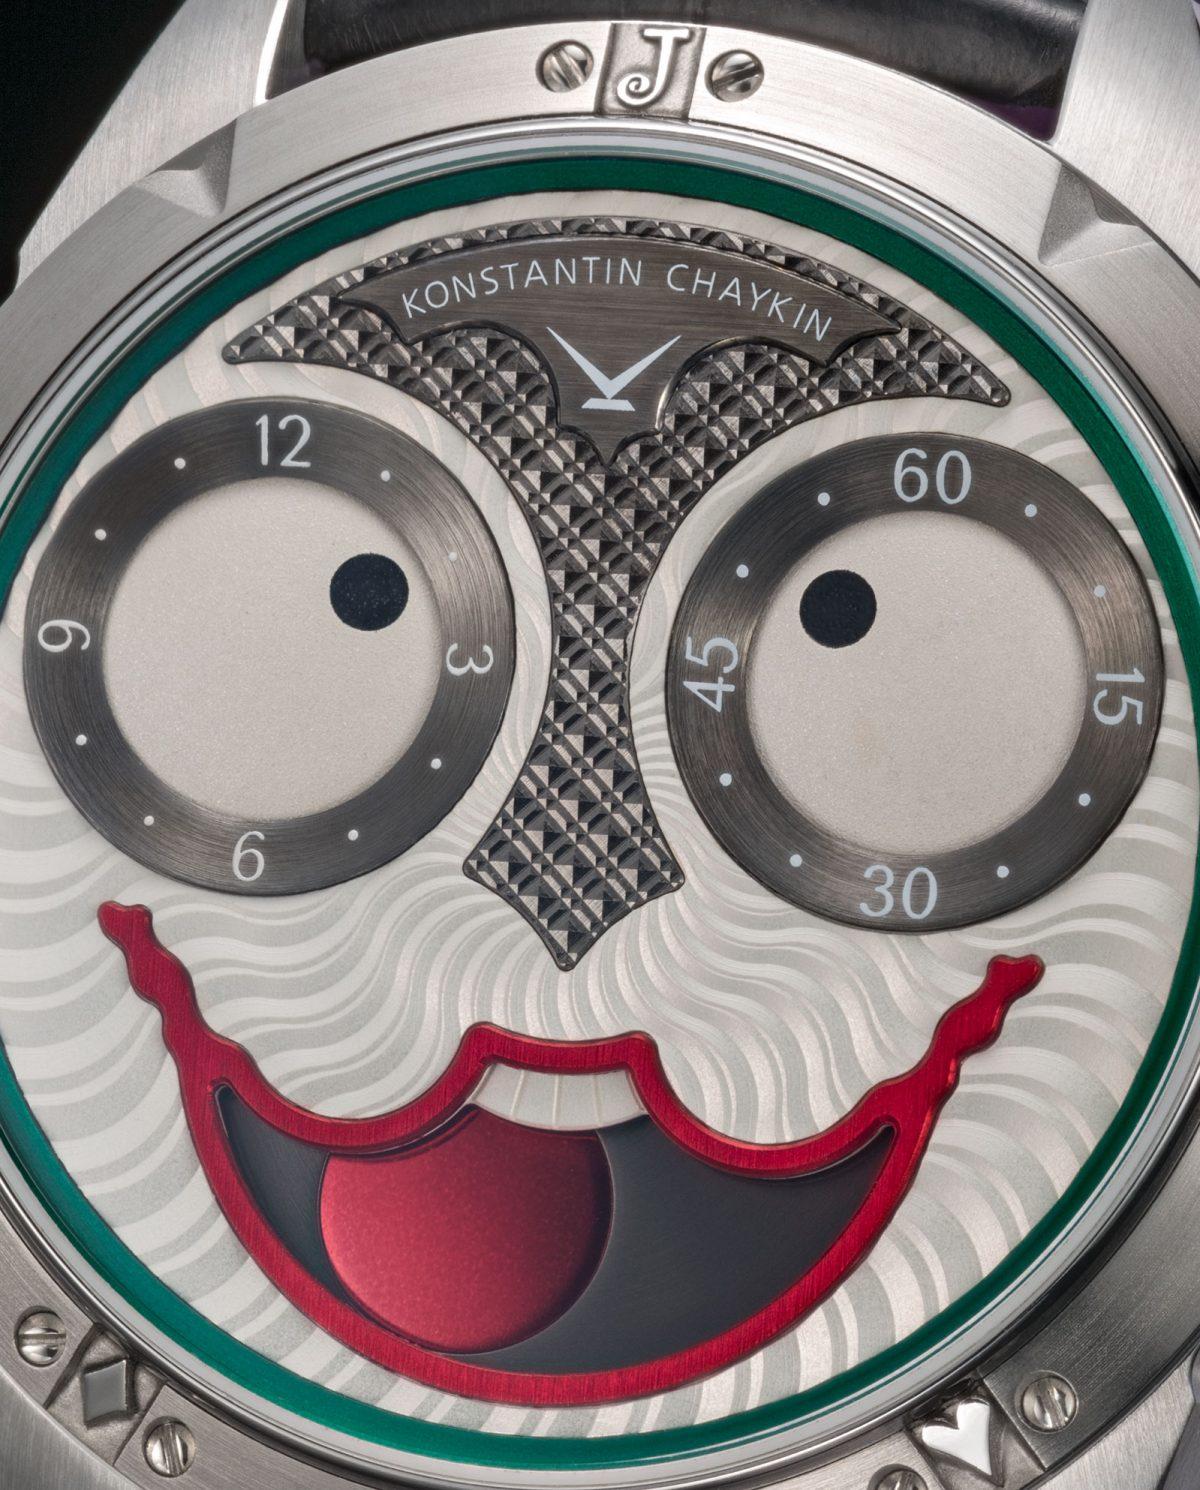 Russian Wath-Maker Konstantin Chaykin Joker Series Limited Edition Purple Leather Strap Replica Watches